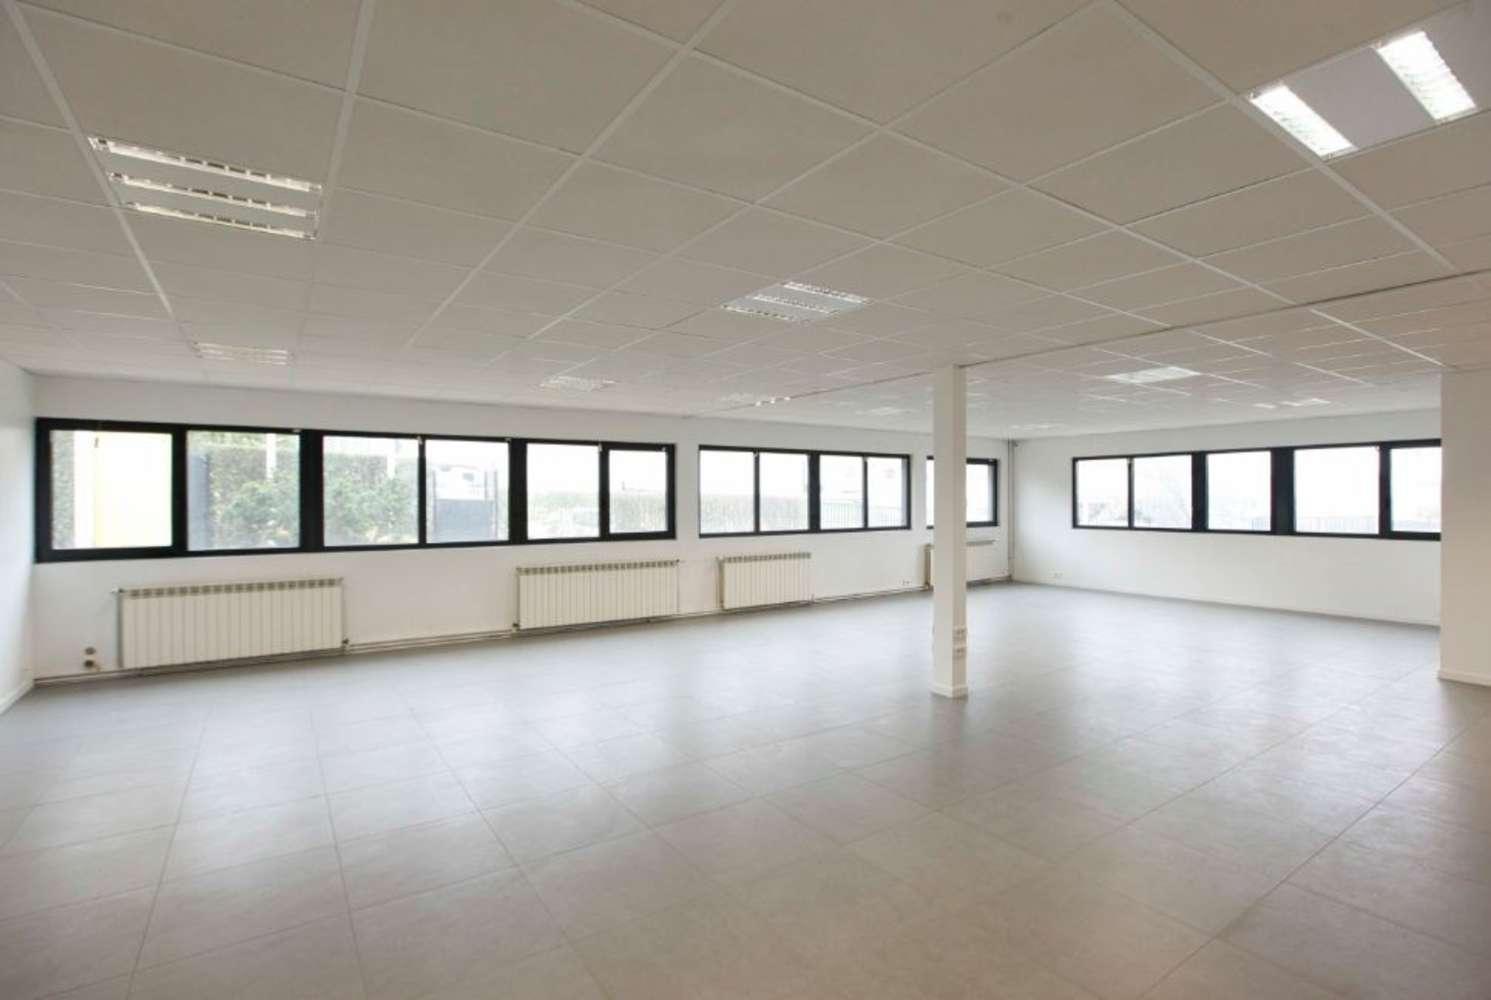 Activités/entrepôt Groslay, 95410 - 4 RUE DES ECRICROLLES - 9450504